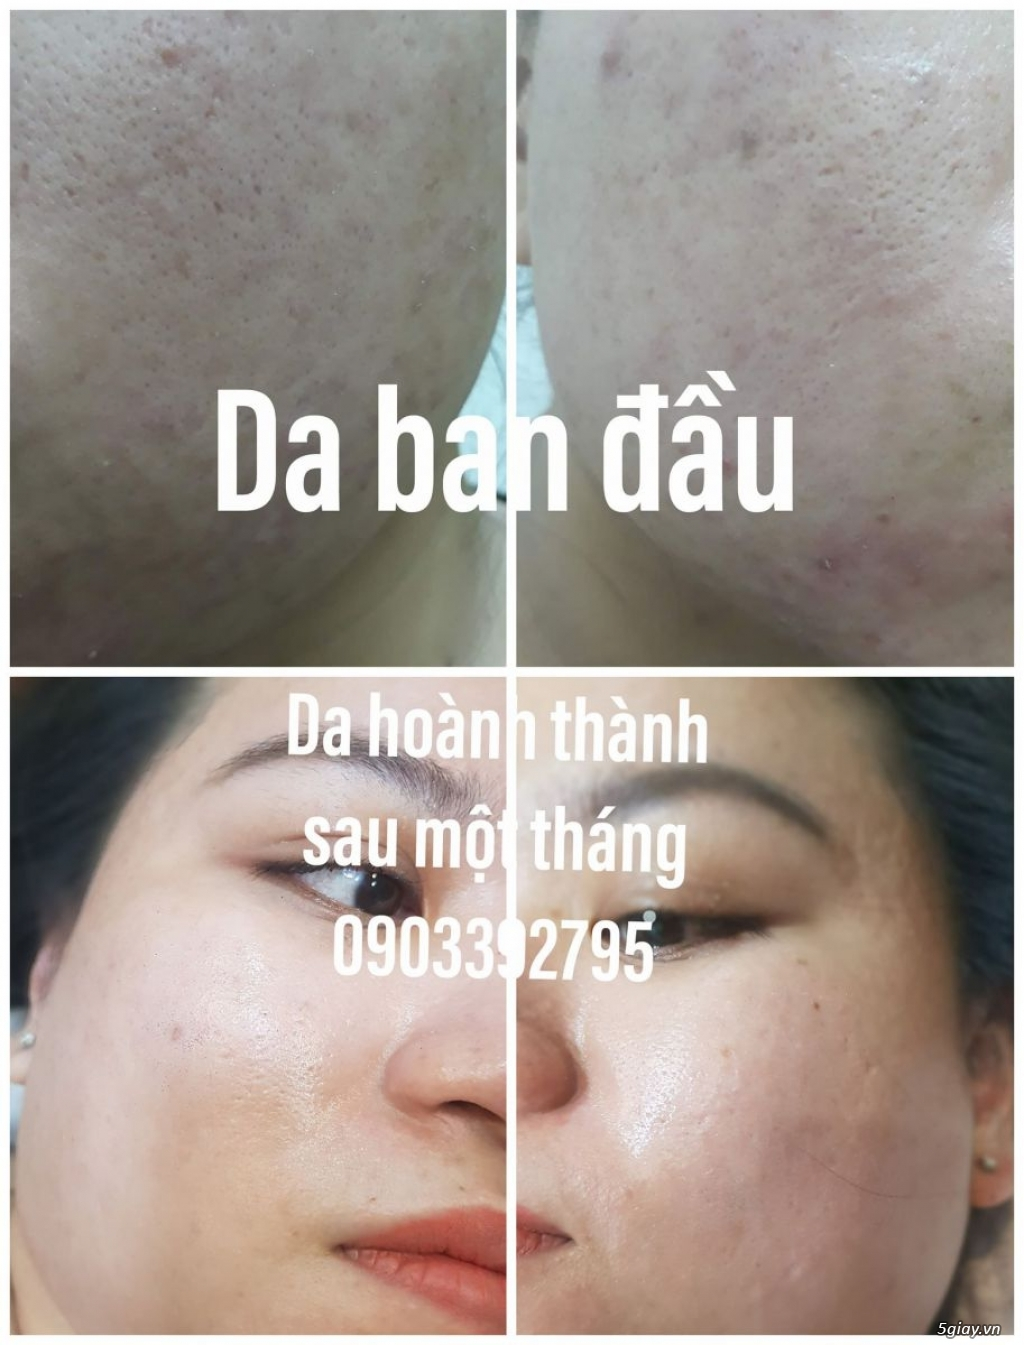 Căng da mặt bằng chỉ Collagen giá bao nhiêu/ Căng da mặt bằng chỉ collagen/ Căng da mặt bằng chỉ - 23